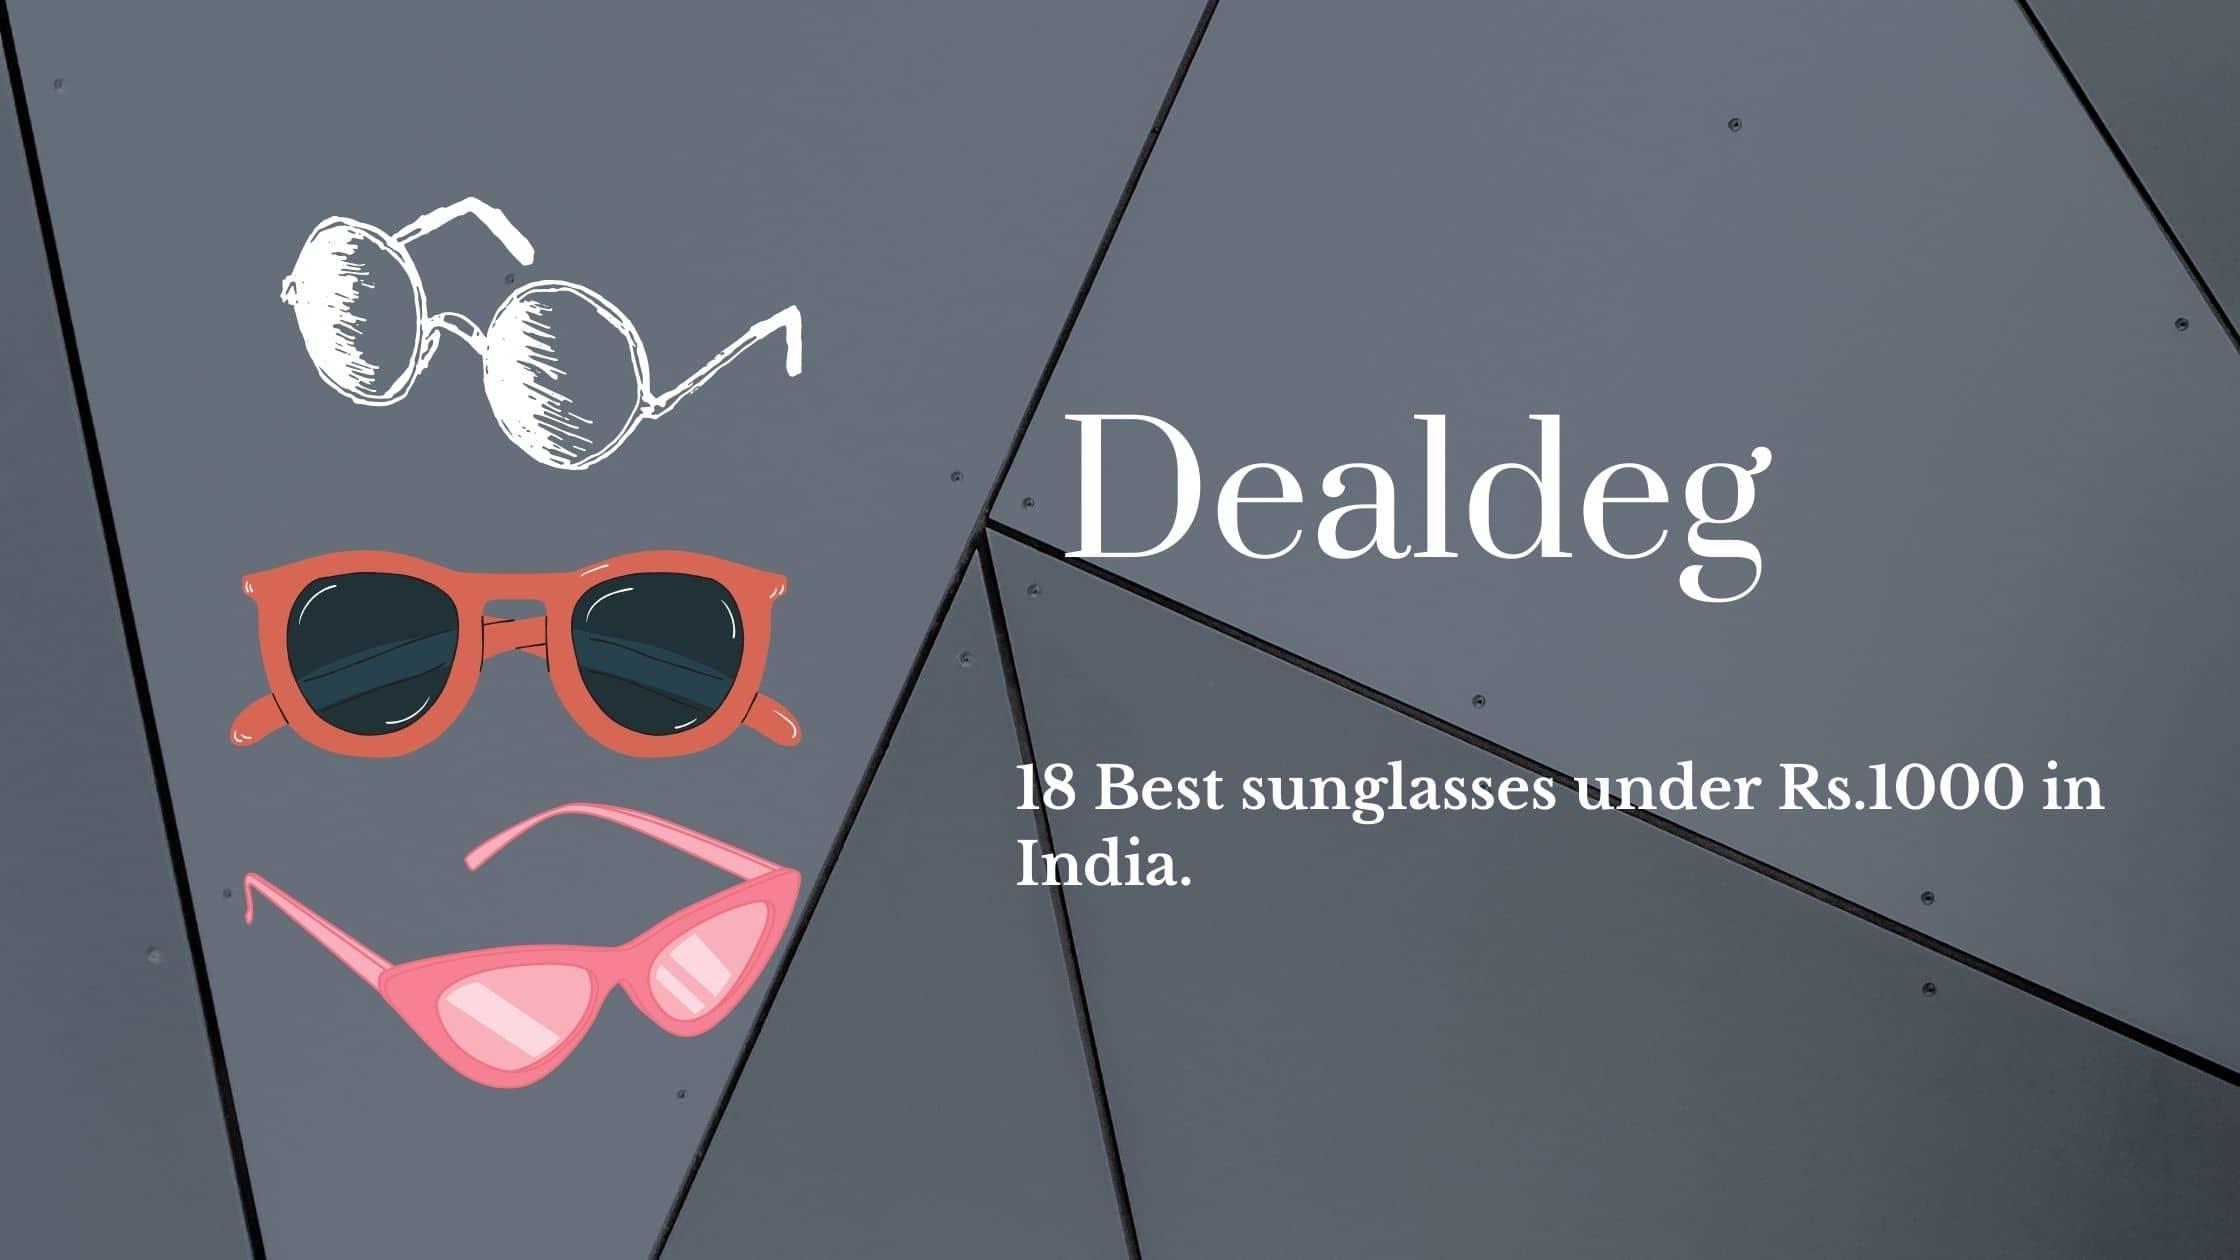 18 Best sunglasses under Rs.1000 in India.